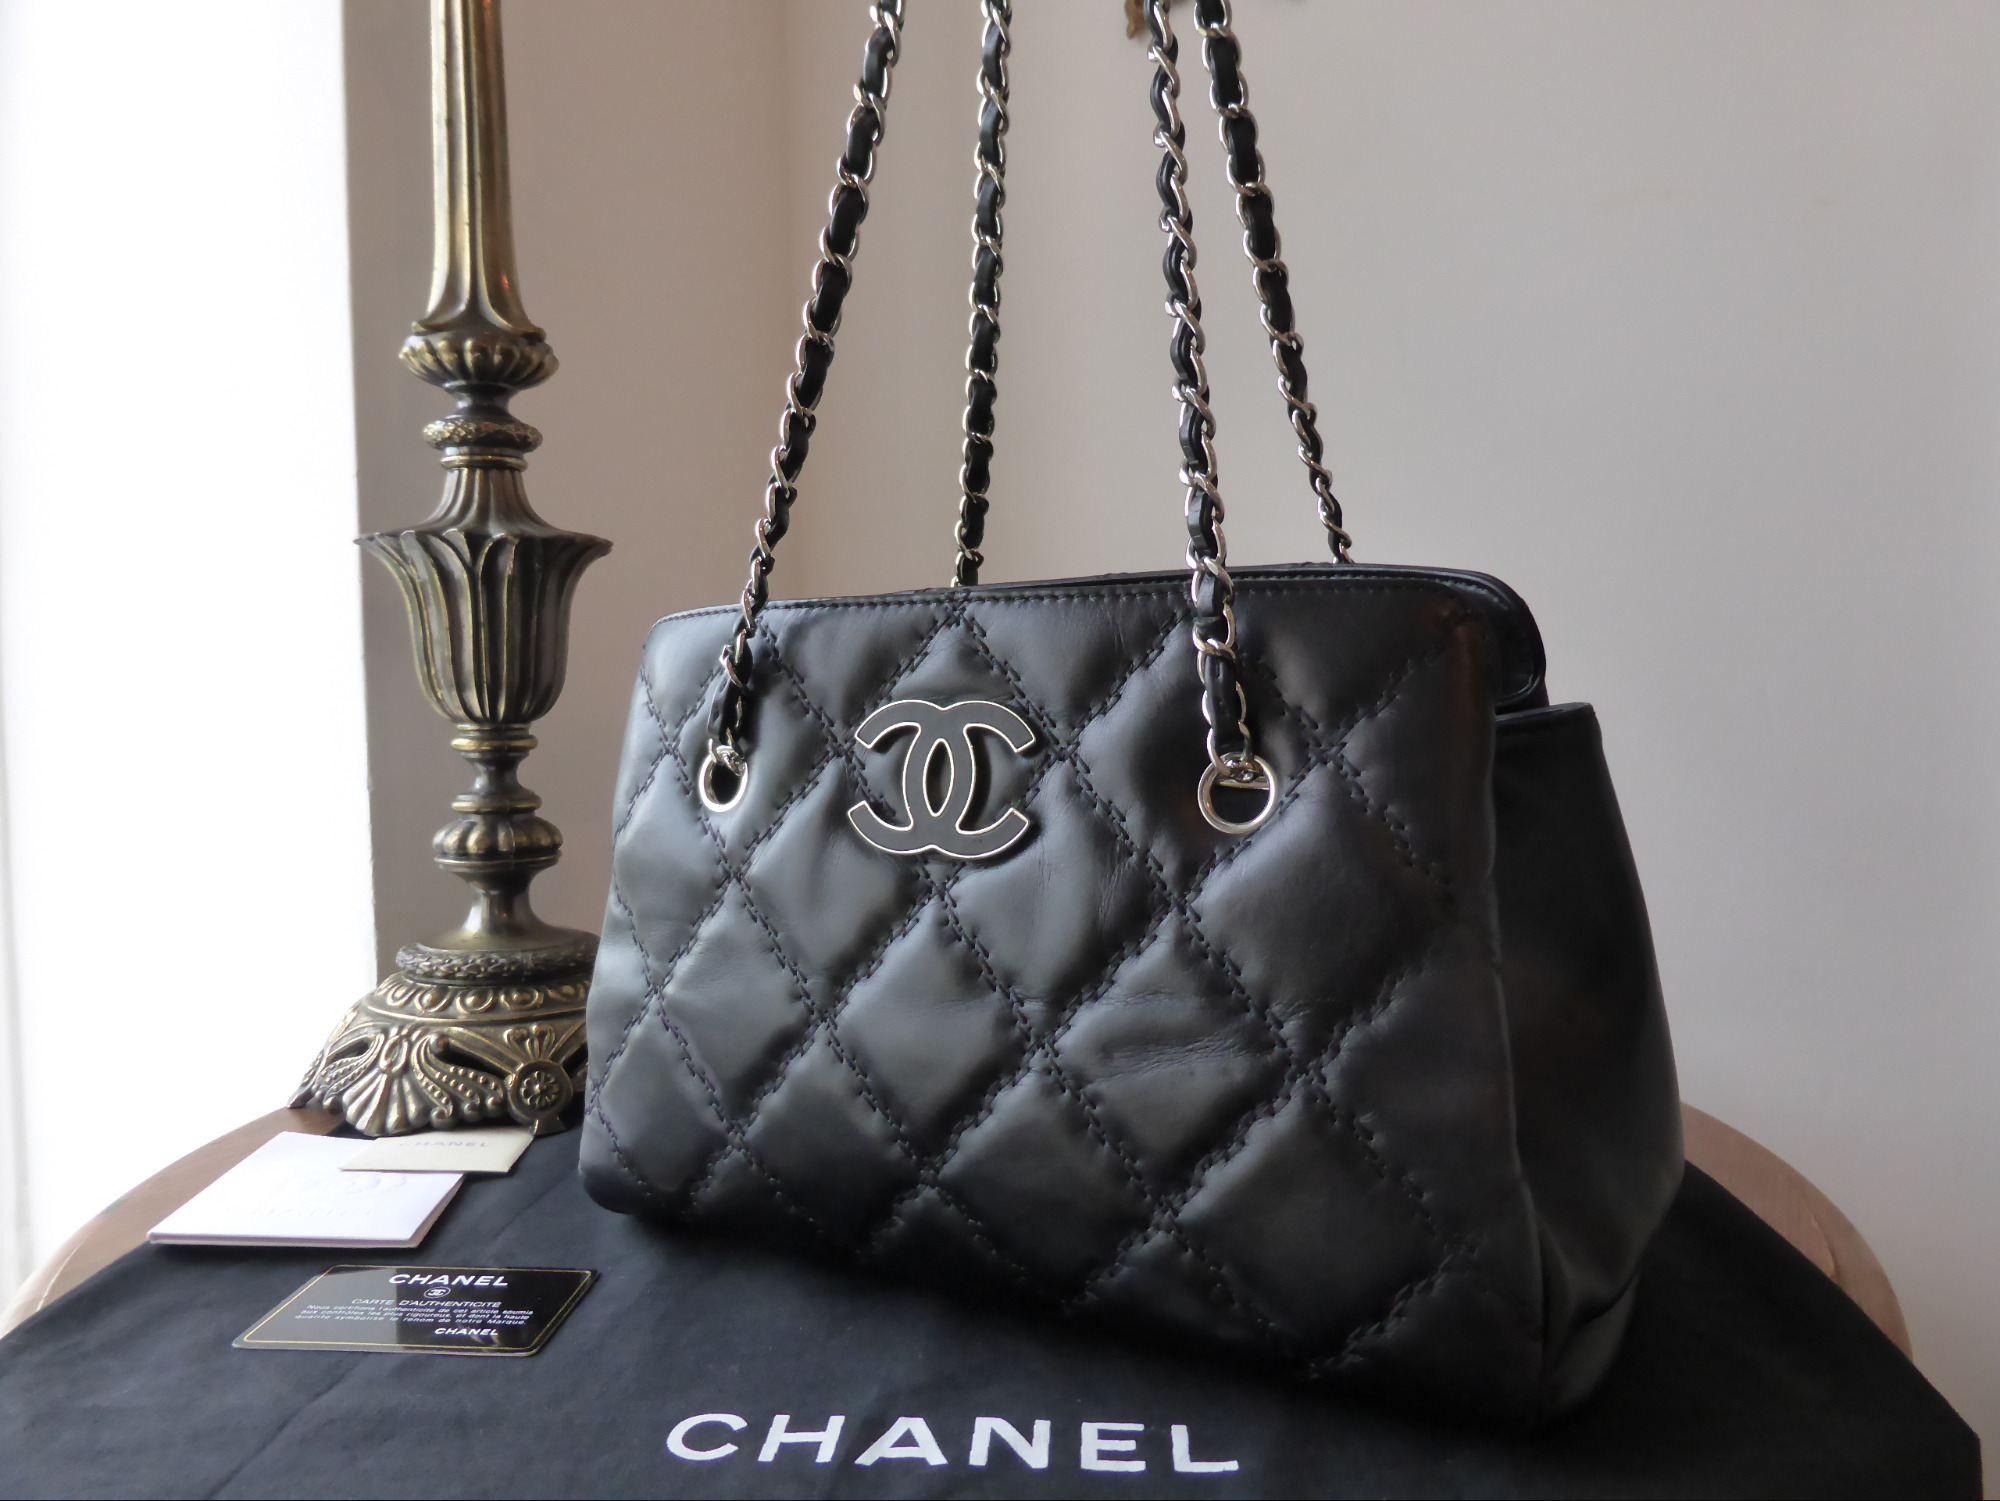 d227651d2494e0 Chanel Shoulder Tote in Black Calfskin - SOLD   Chanel   Chanel ...